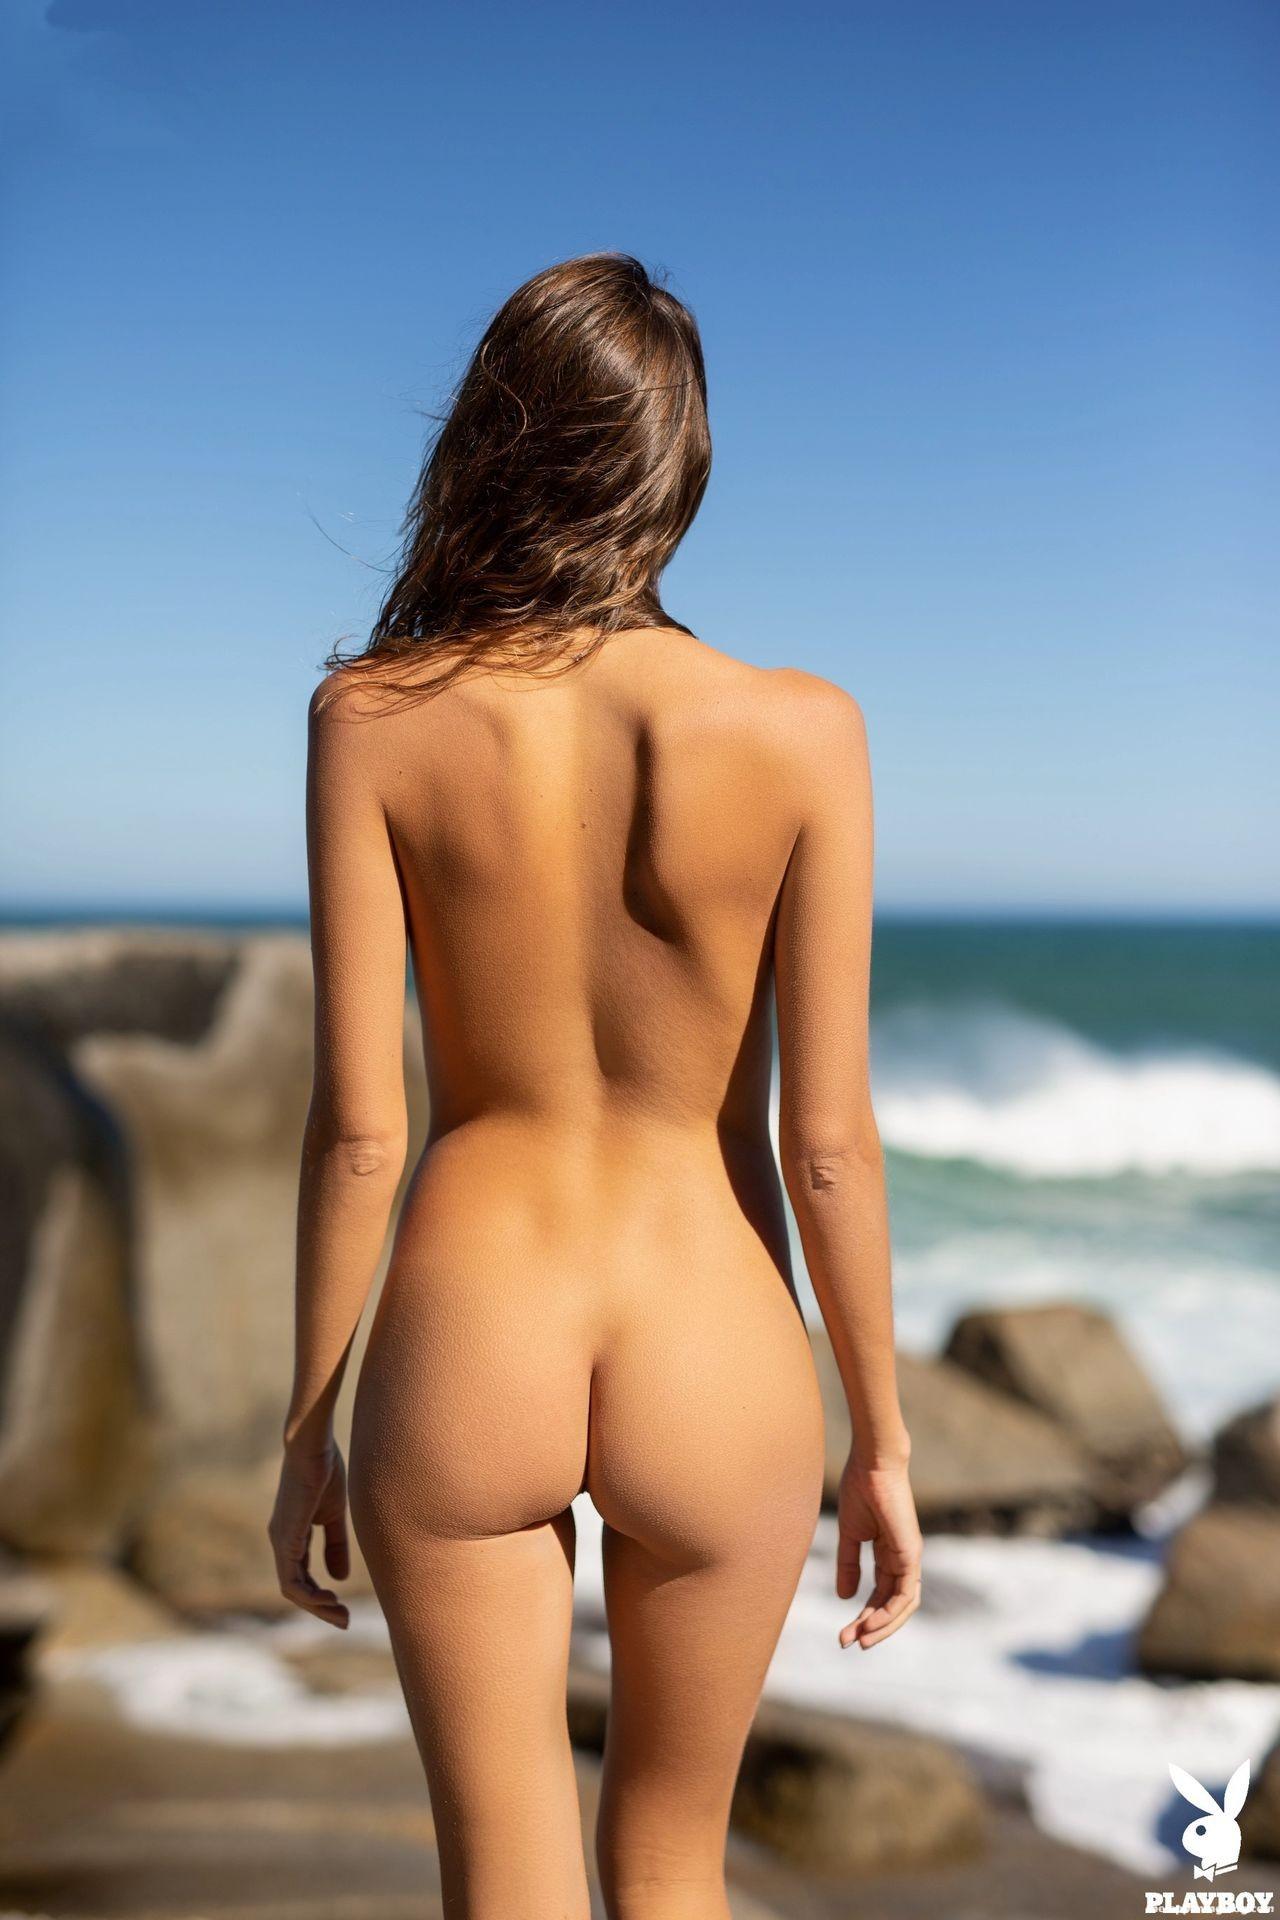 Katya clover nackt bilder